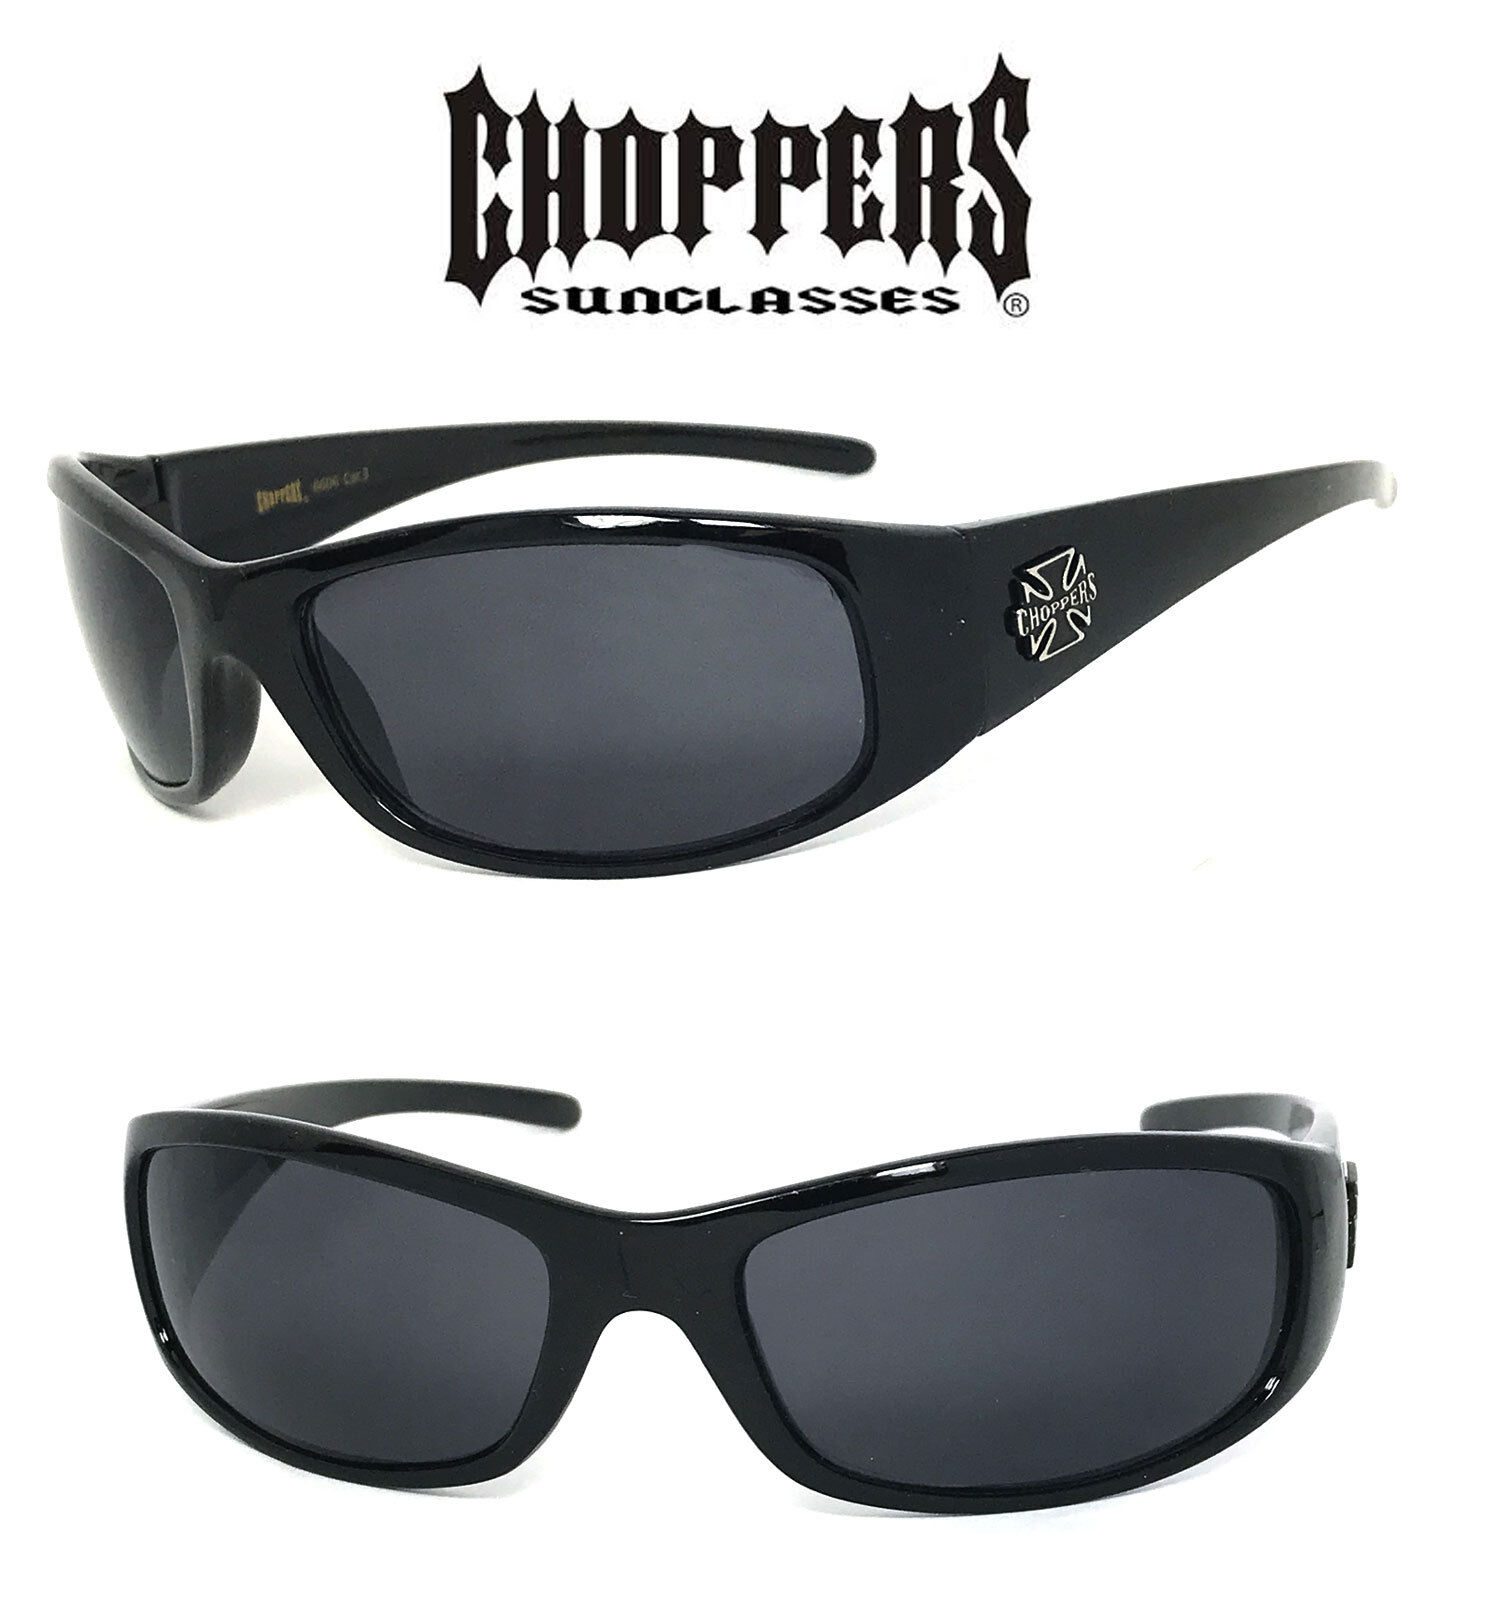 Night Driving Yellow Lens C24 Cross New Choppers Bikers Men Sunglasses